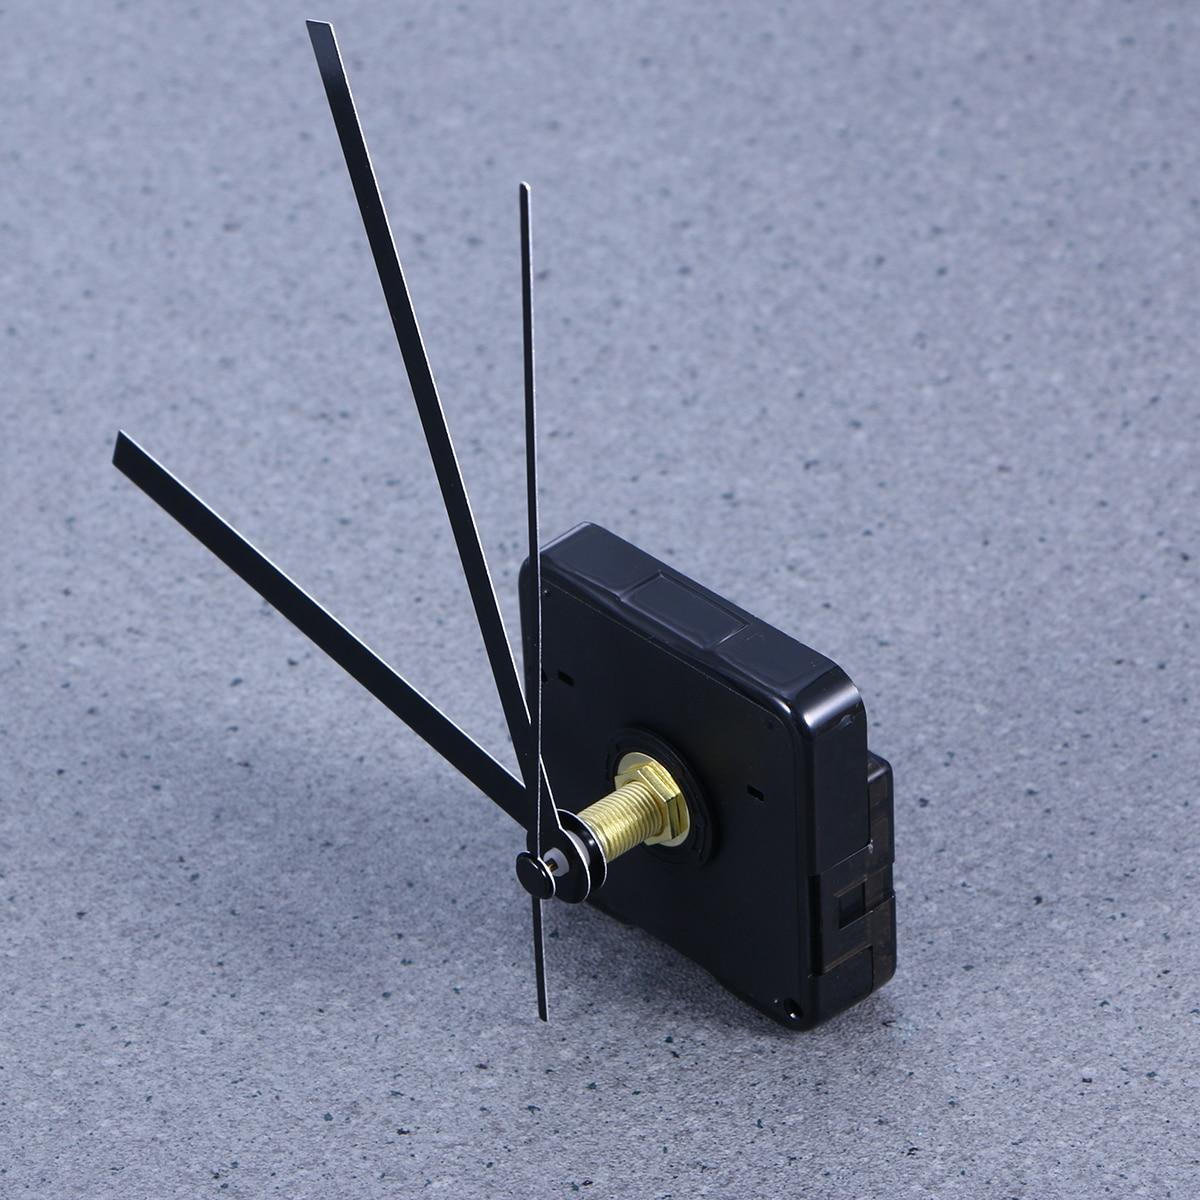 Silent Clock Movement Kits For DIY Clock Replacement Clock Movement Mechanism Repair DIY Tool Kit